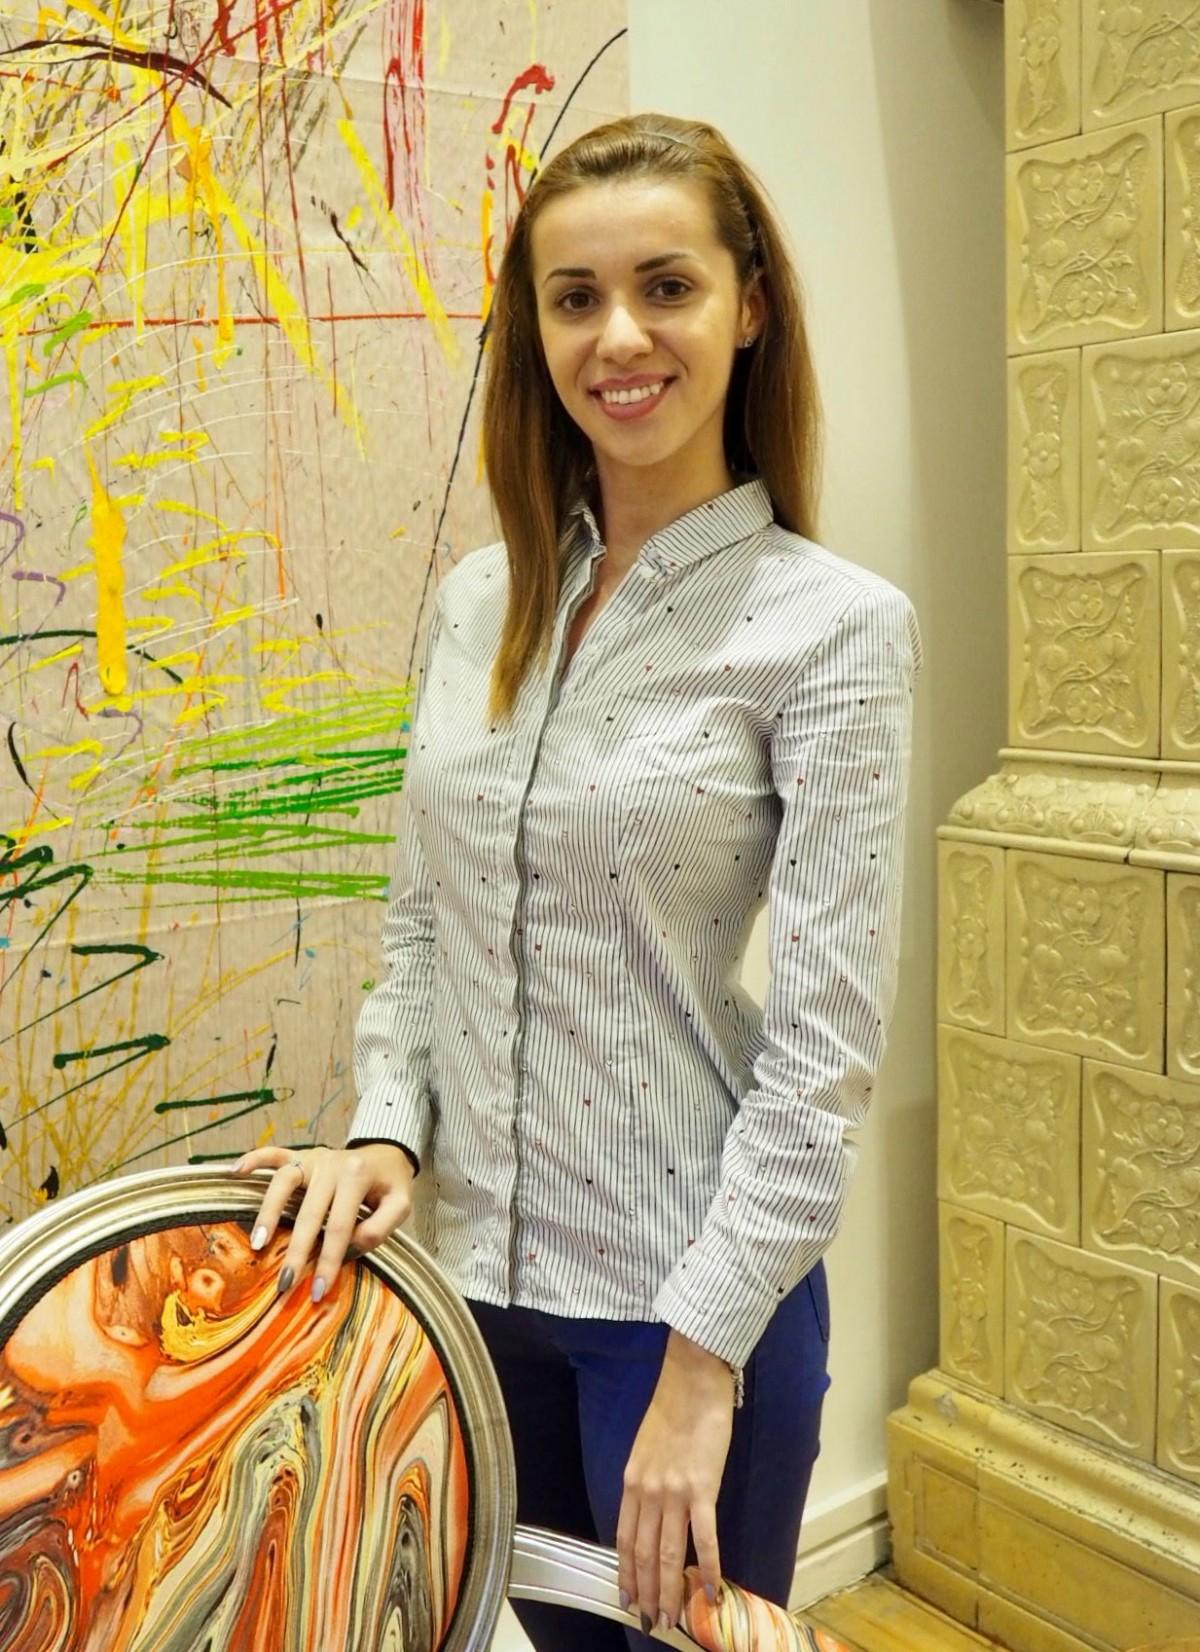 New faces at Unique Estates - Lora Petrova